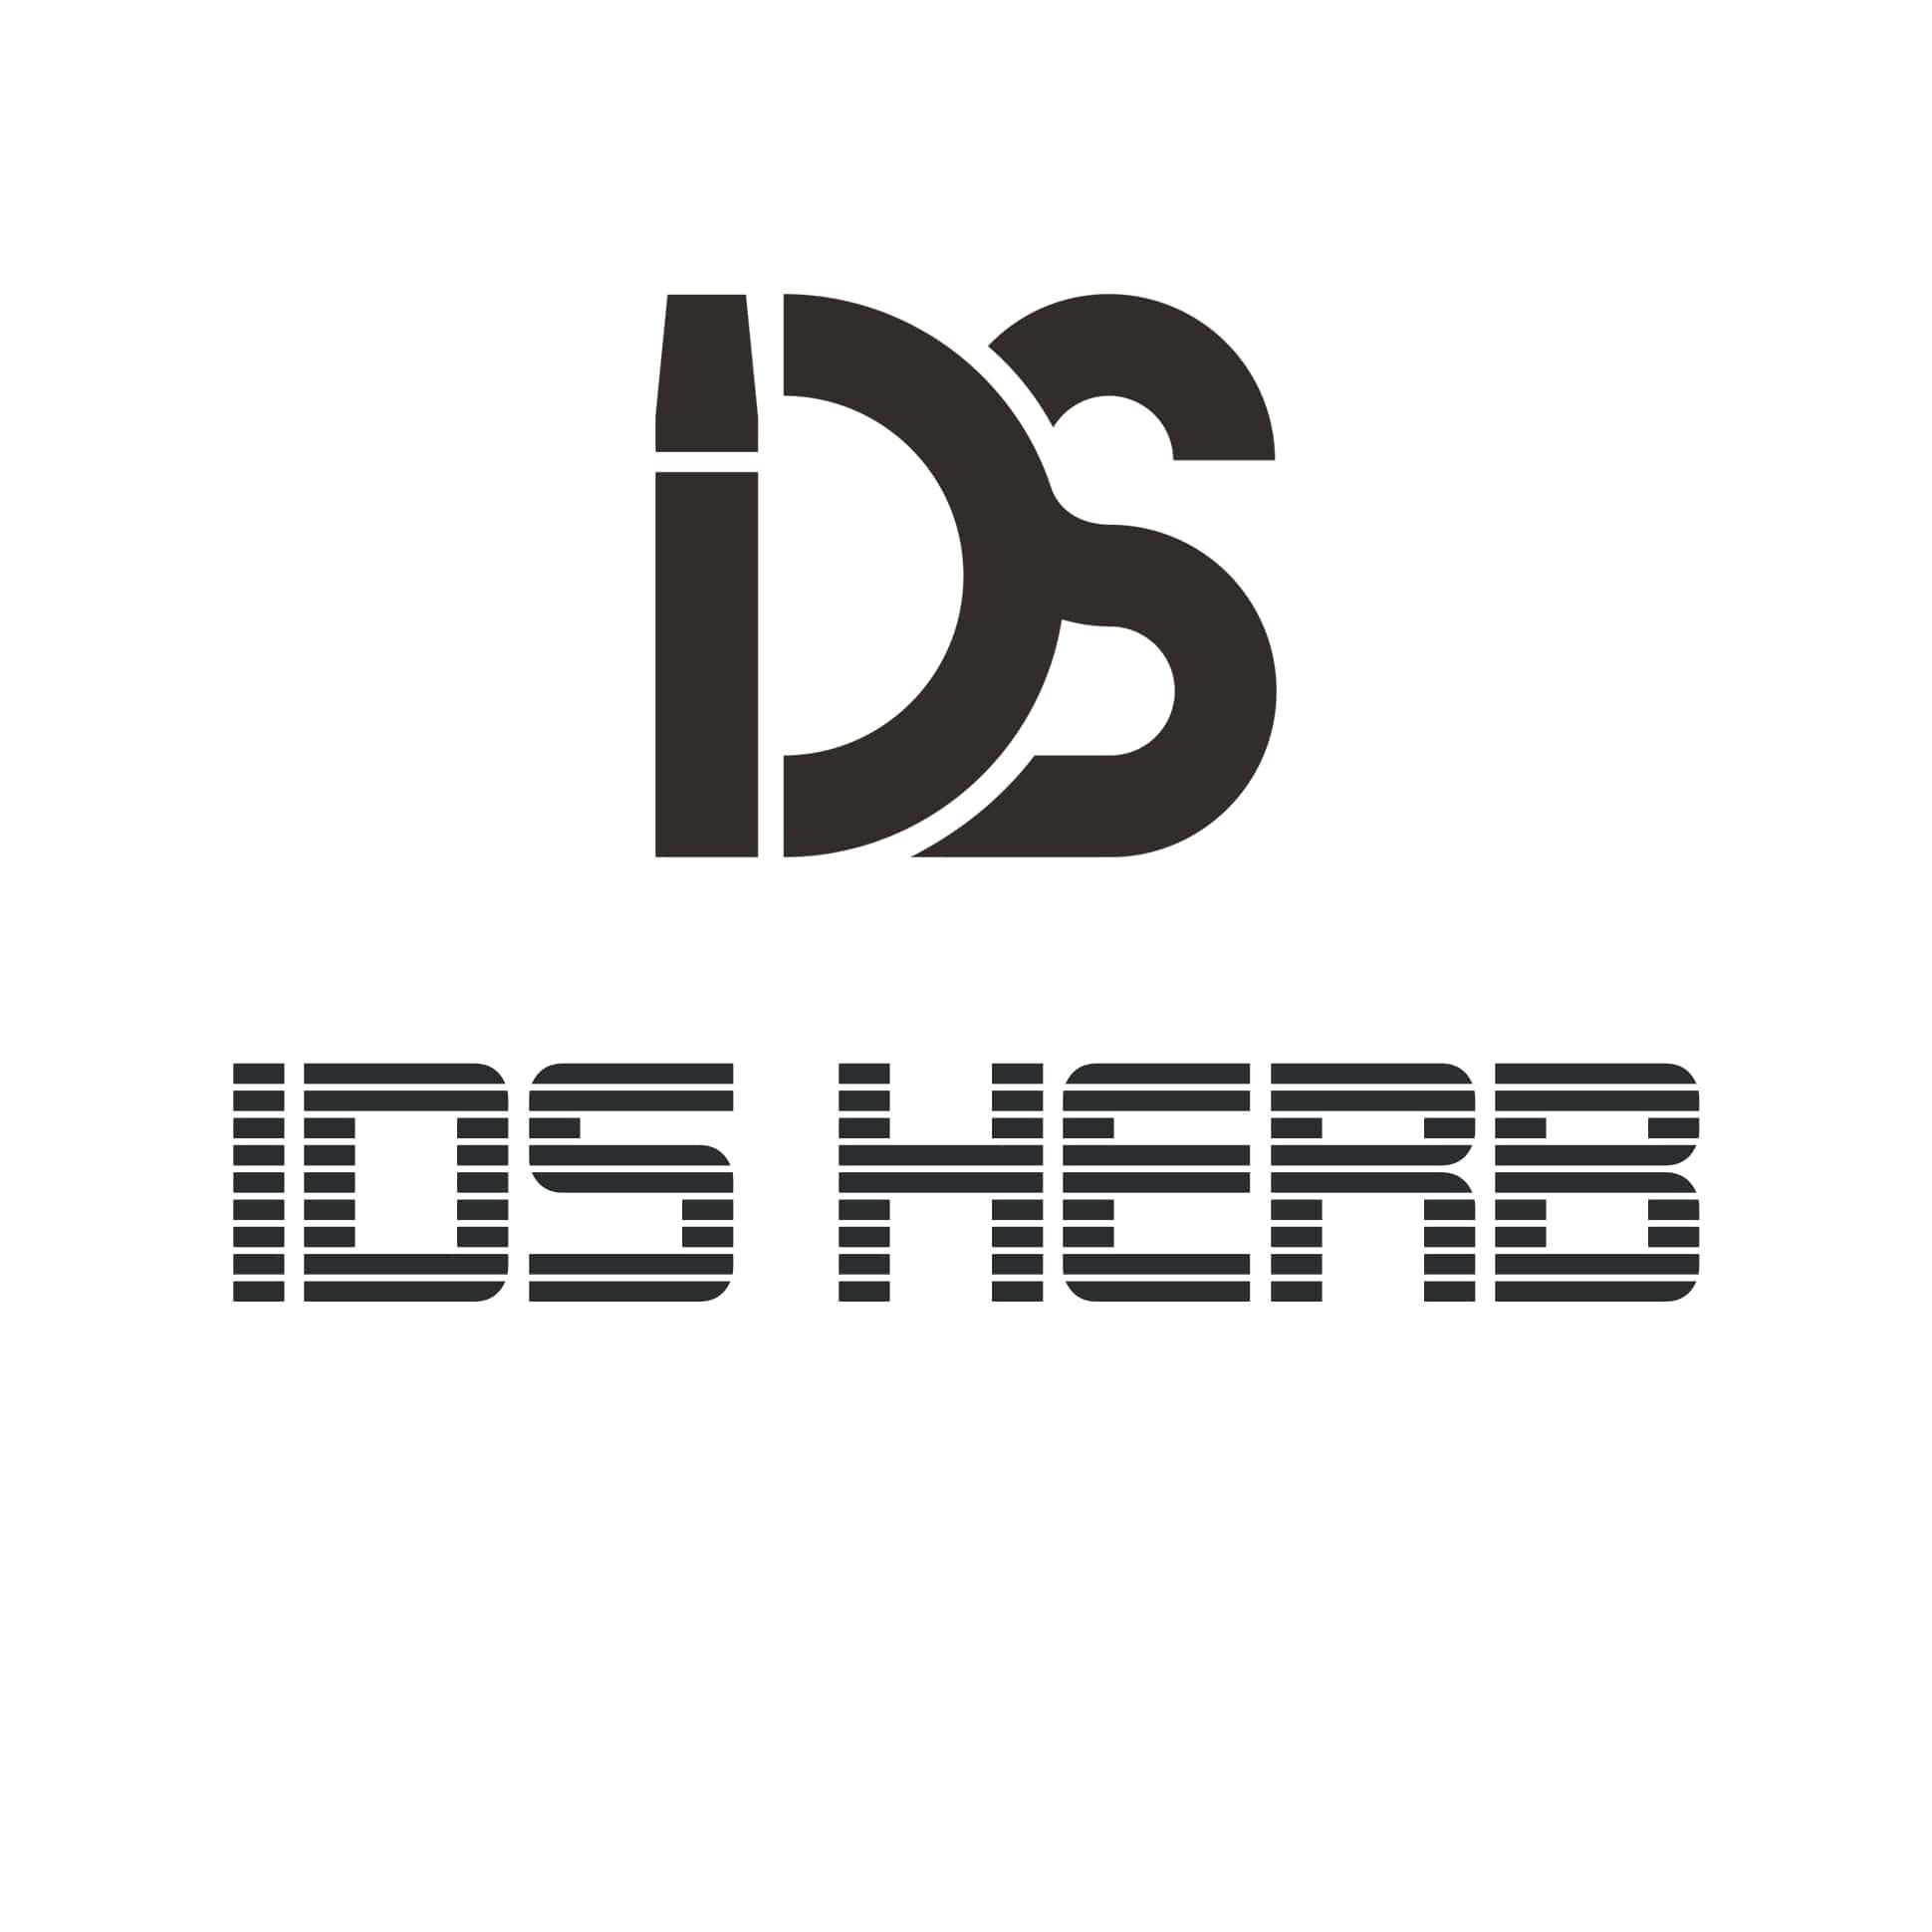 IDS HERB健康草本液全国招代理